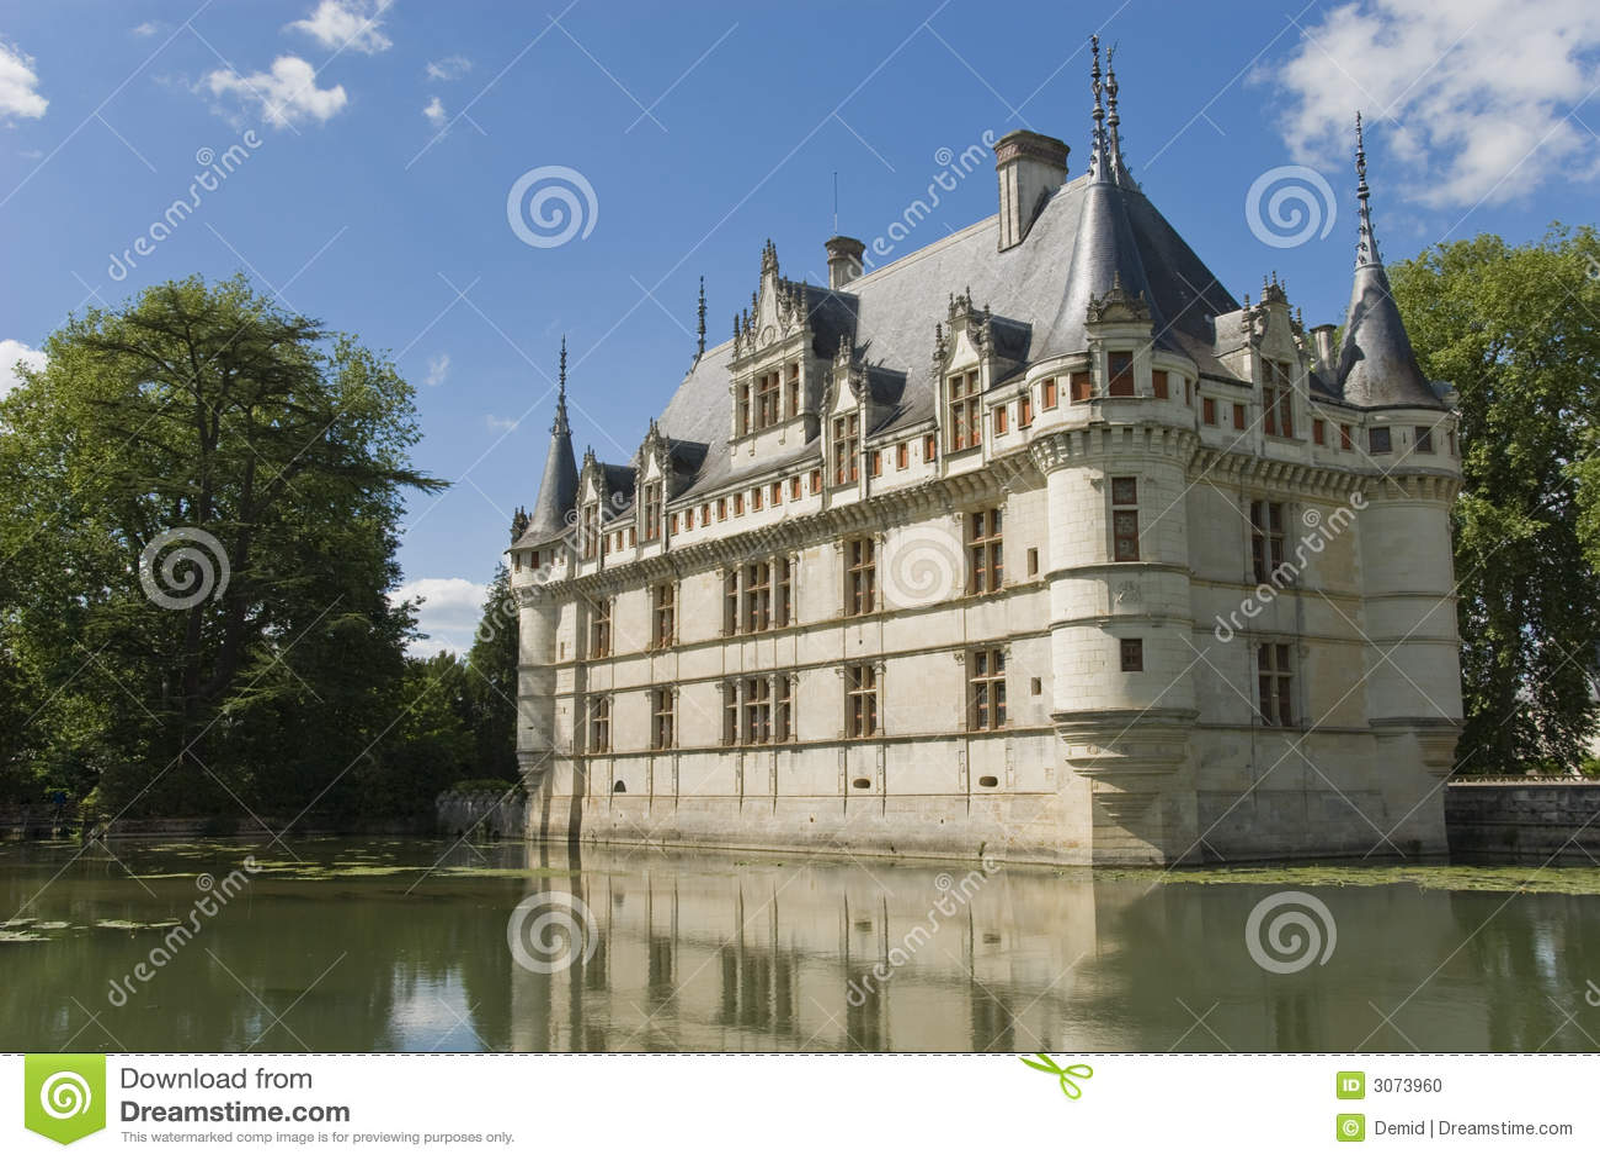 chateau azay le rideau france stock photo image 3073960. Black Bedroom Furniture Sets. Home Design Ideas